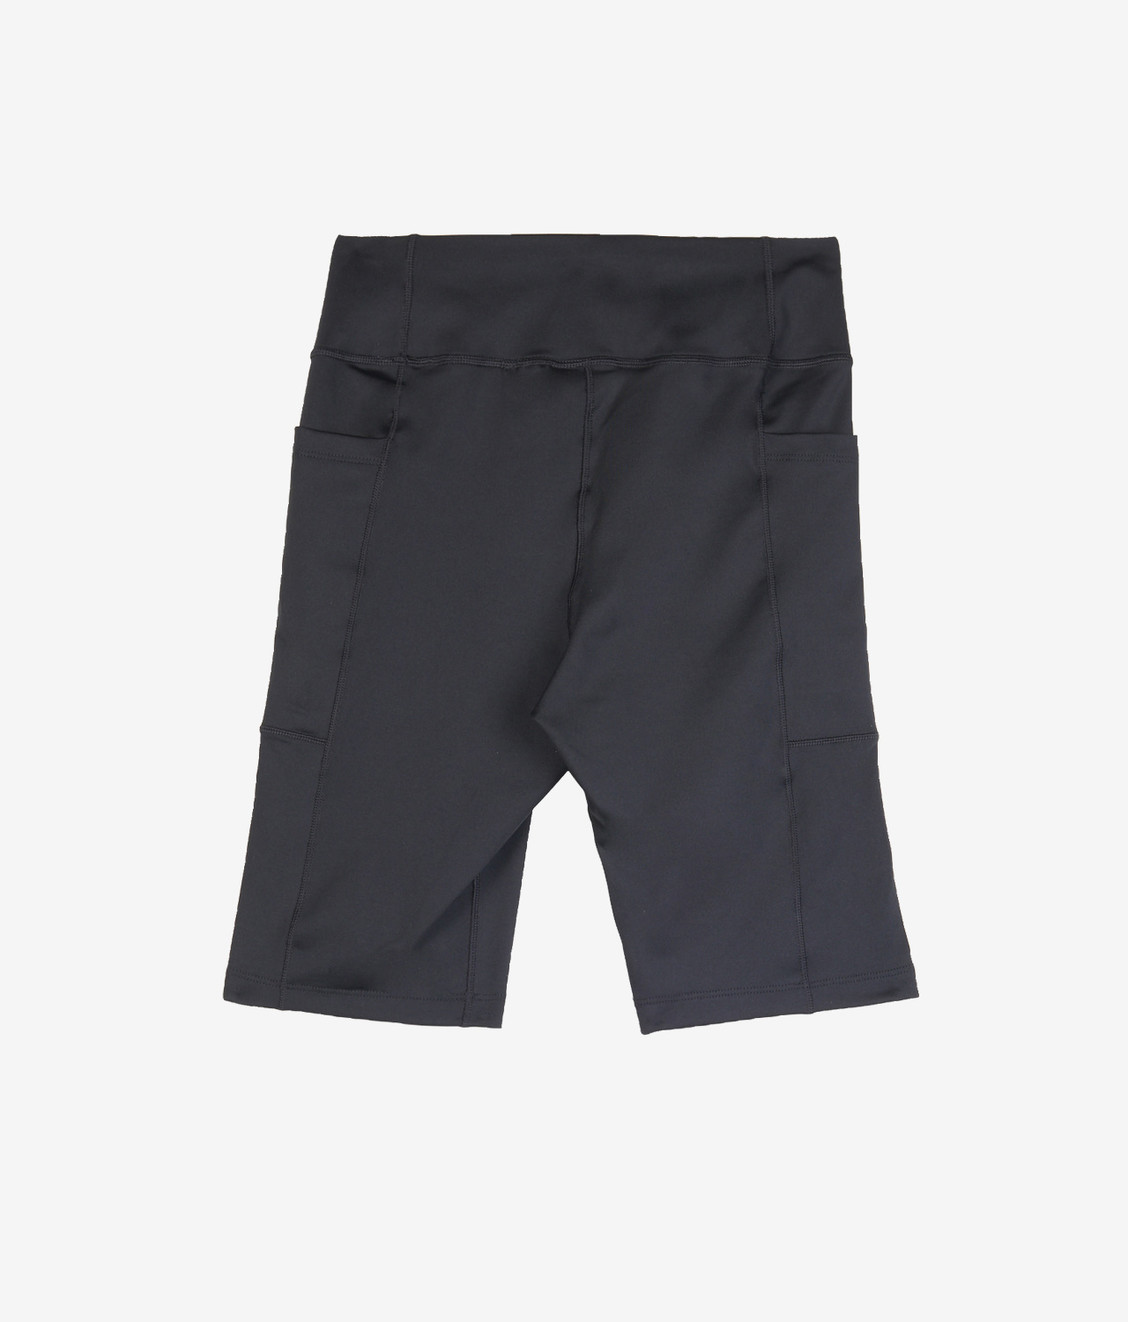 Nike Nike ACG Black Cycling Short